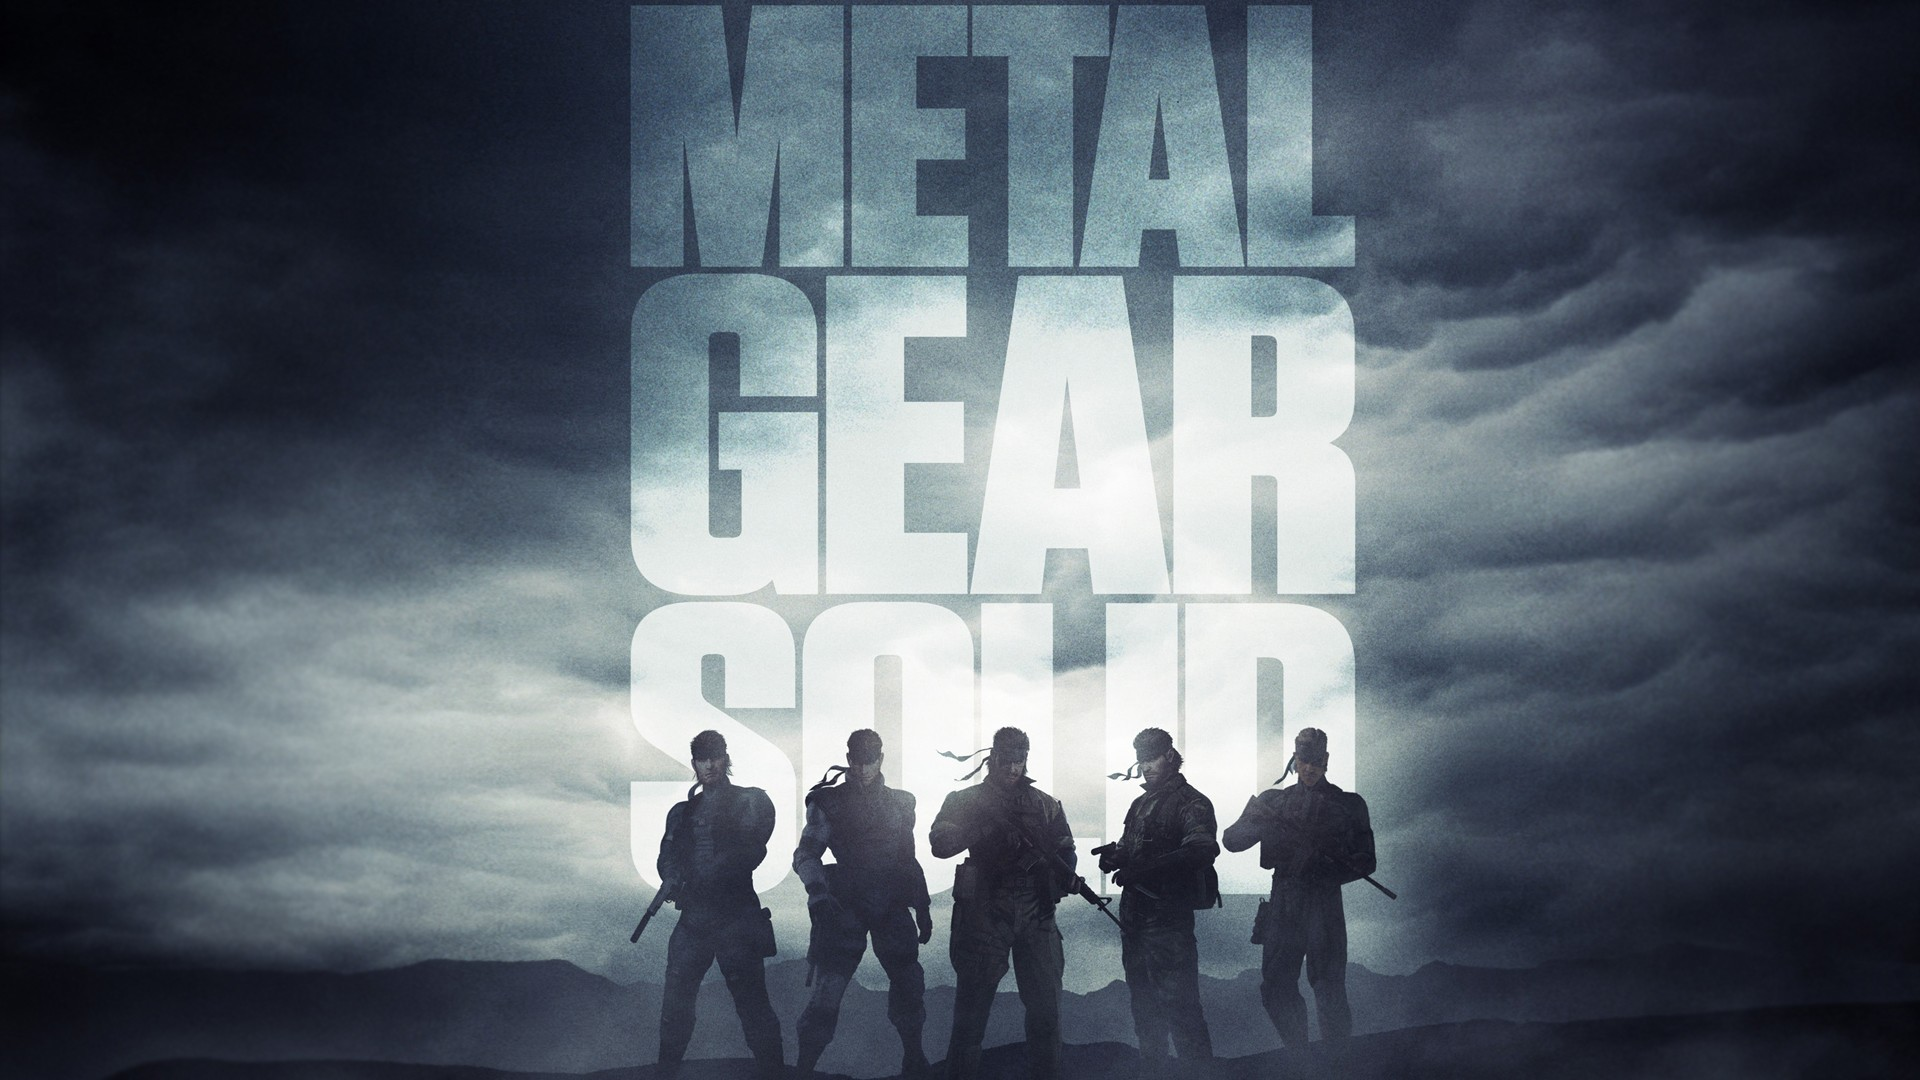 Metal Gear Solid Hd Wallpaper Background Image 1920x1080 Id